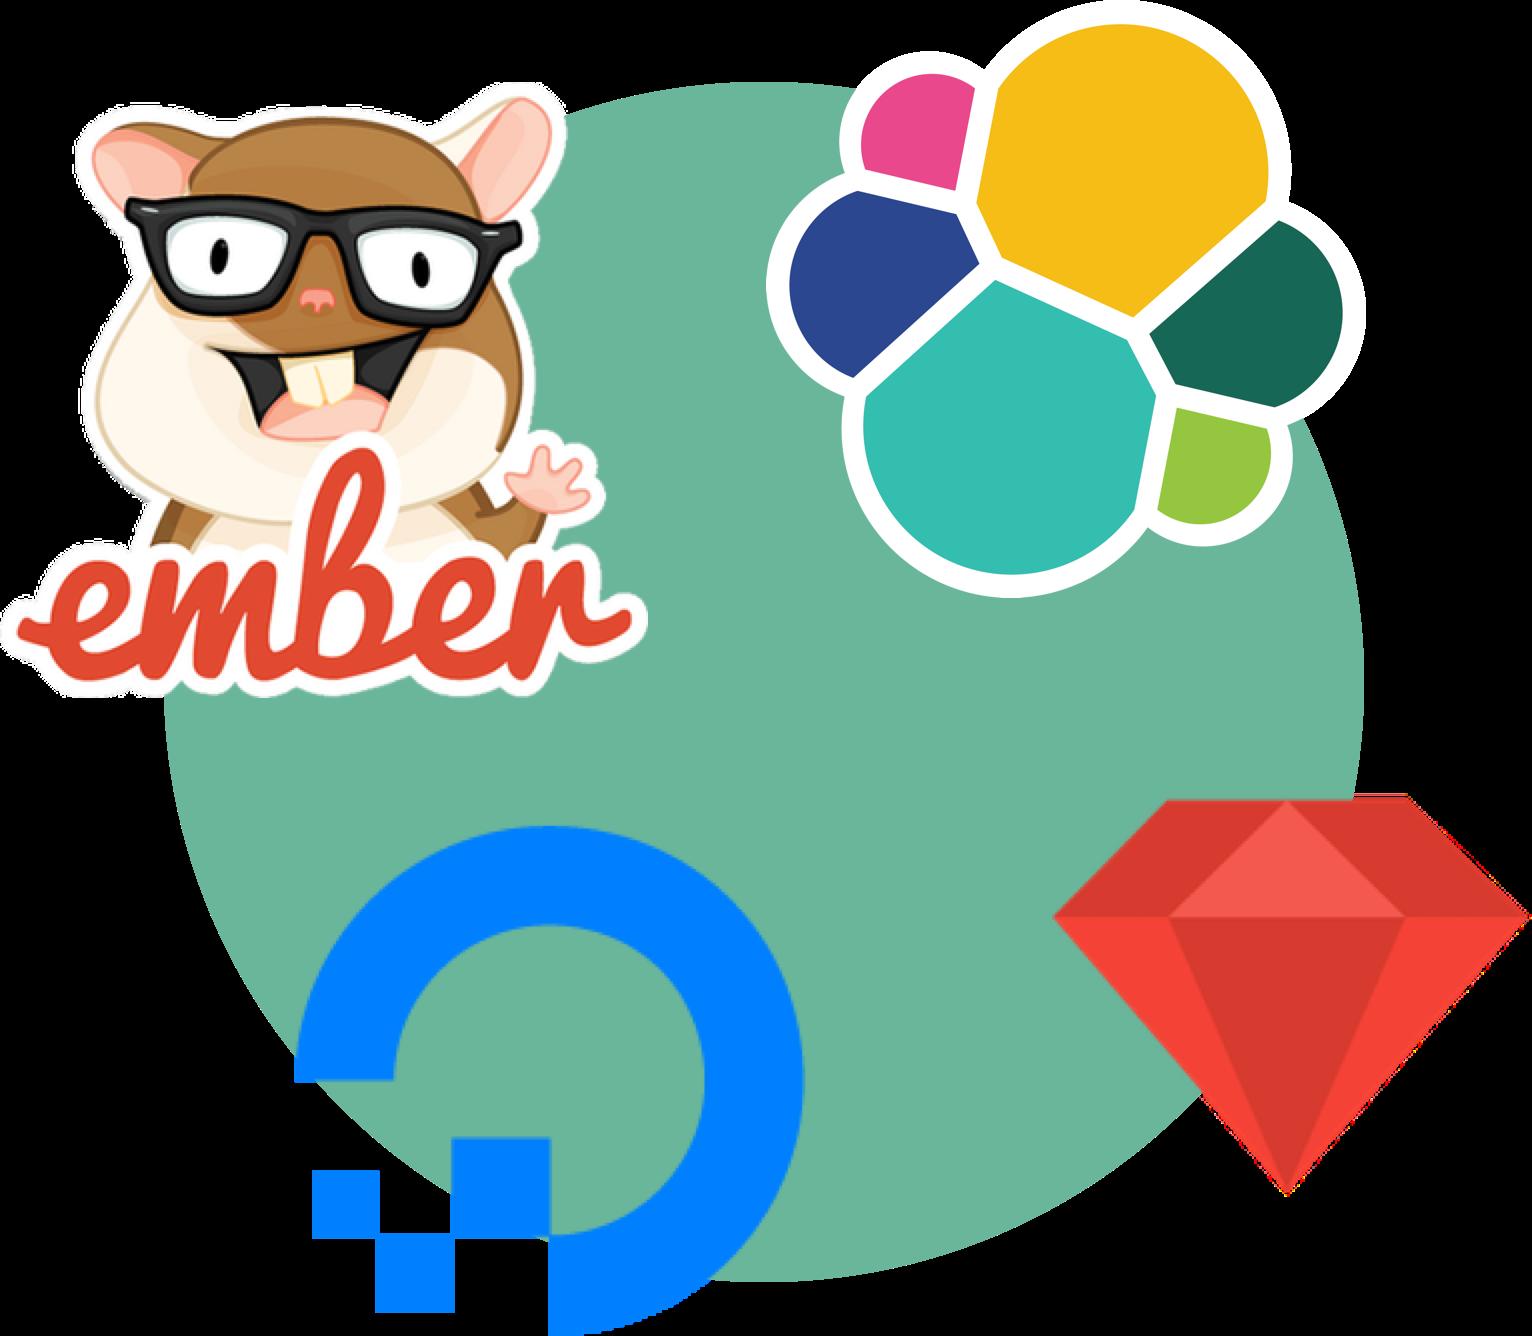 Ember, Ruby on Rails, ElasticSearch and Digital Ocean